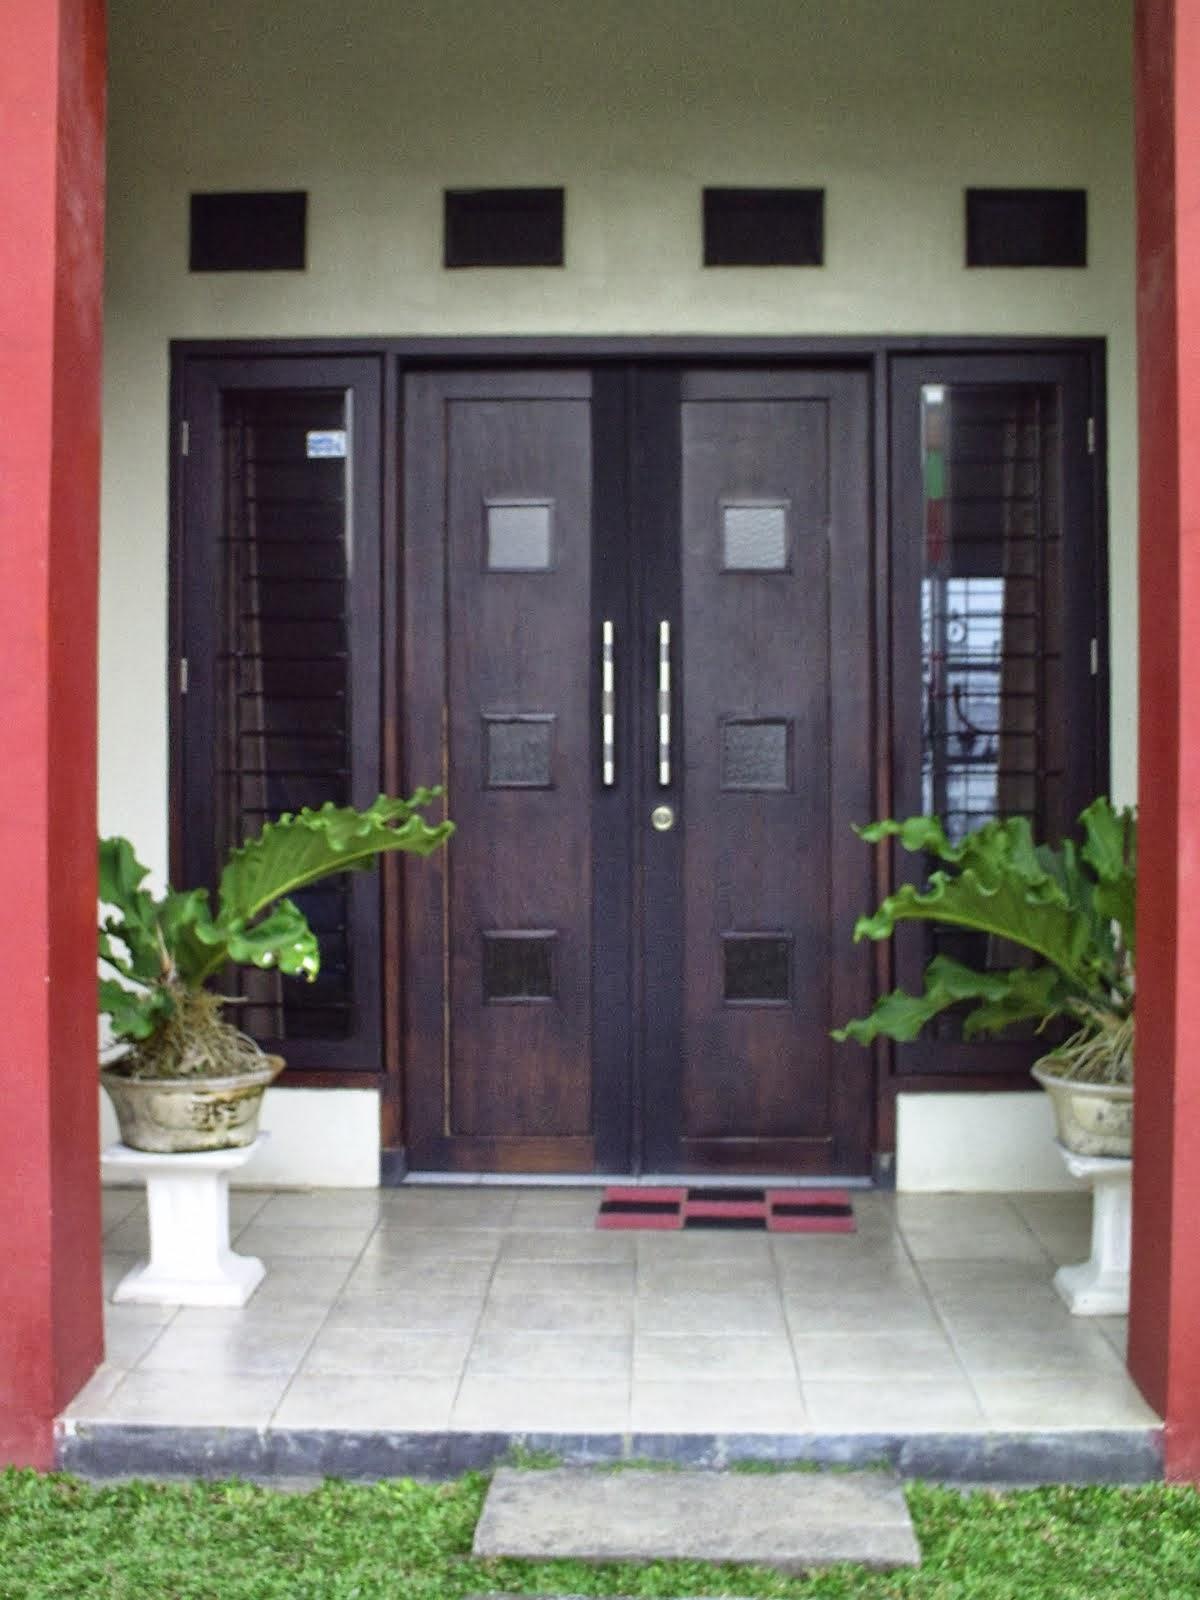 Contoh Gambar Pintu Rumah Minimalis | Model Minimalist